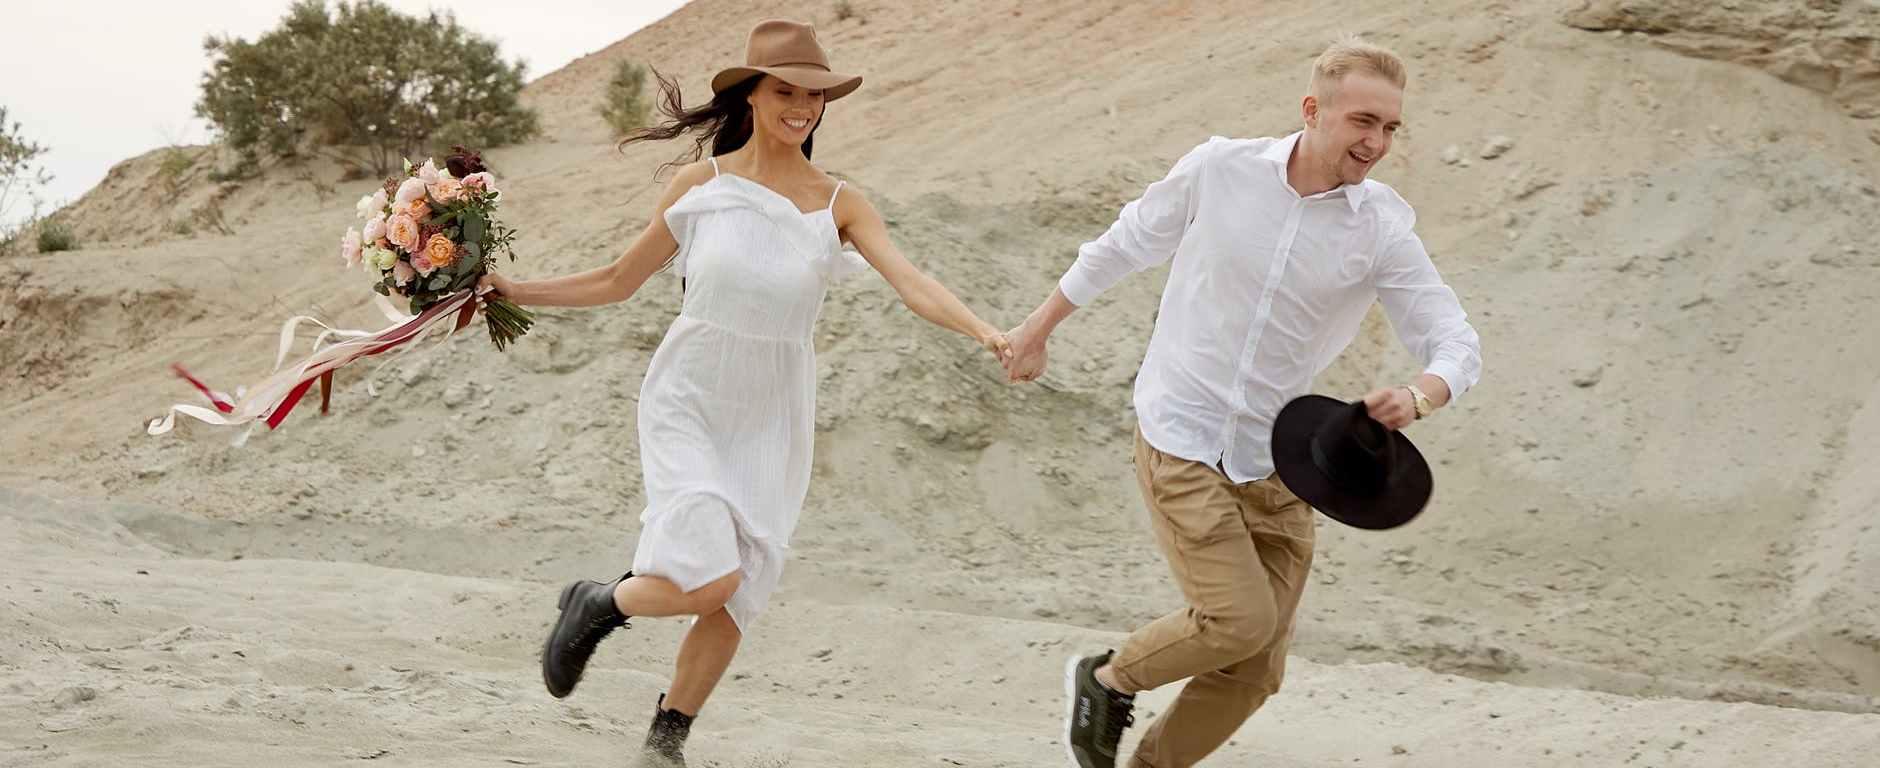 attraction, love, woman man, έλξη, έρωτας, σχέση, συναίσθημα, άνδρας γυναίκα, τι ελκύει μία γυναίκα σε έναν άνδρα, ψυχολογία, ζευγάρι, couple,